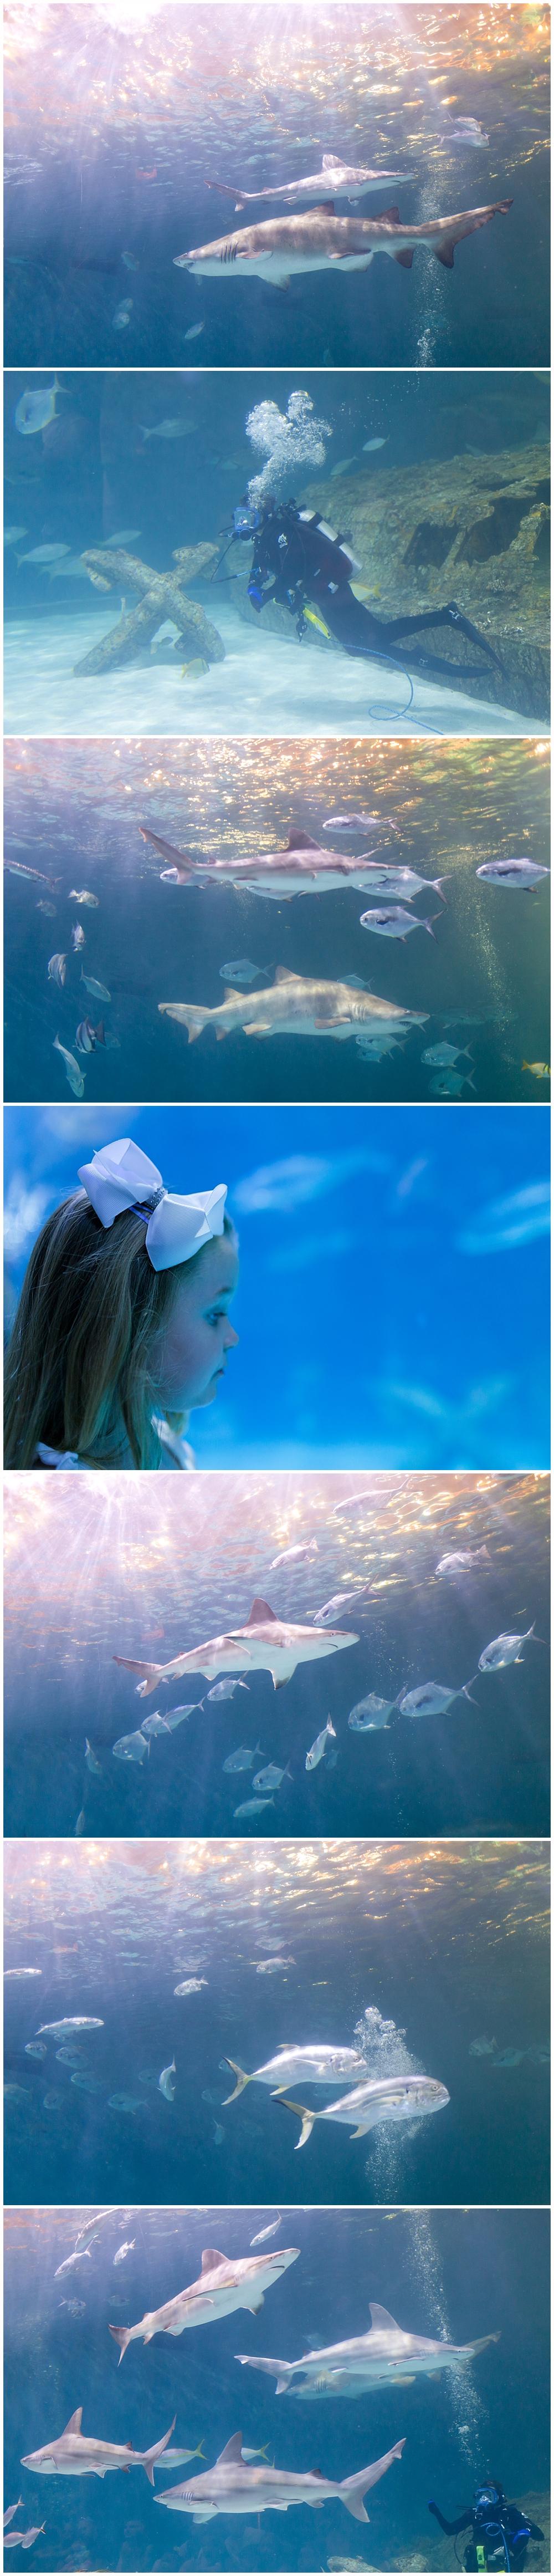 sharks and scuba diver at North Carolina Aquarium on Roanoke Island